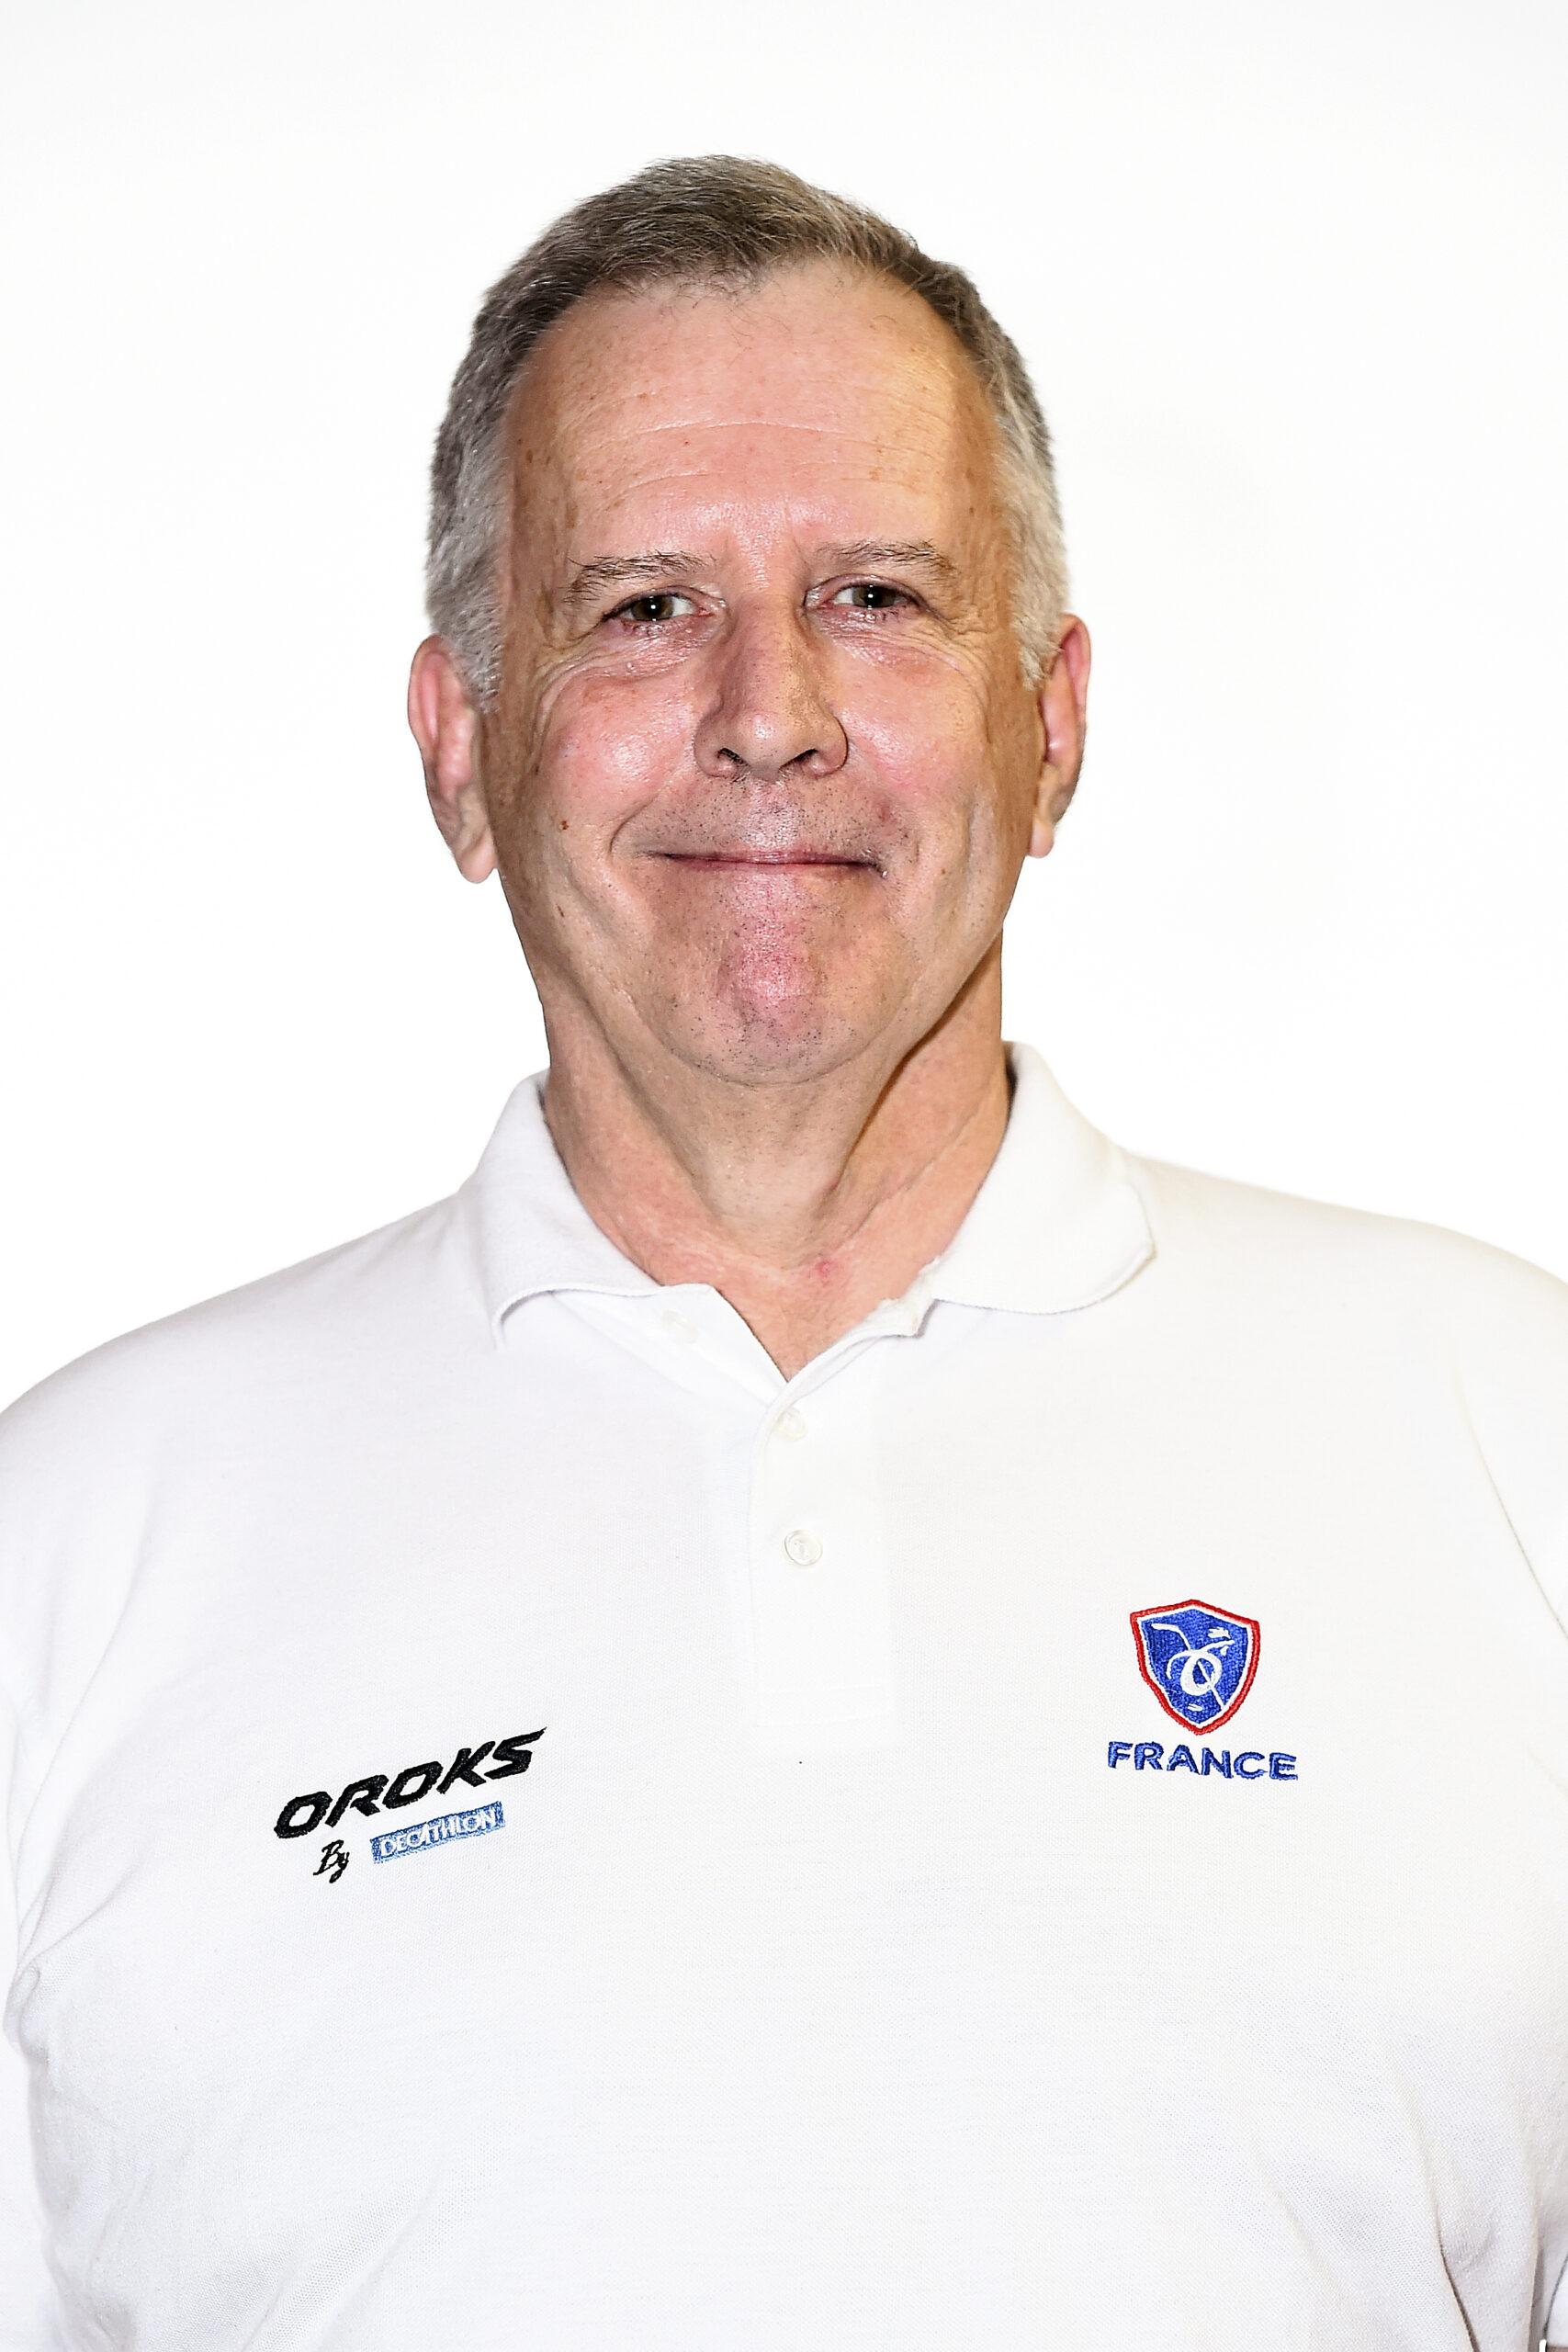 Stéphane De Rycke